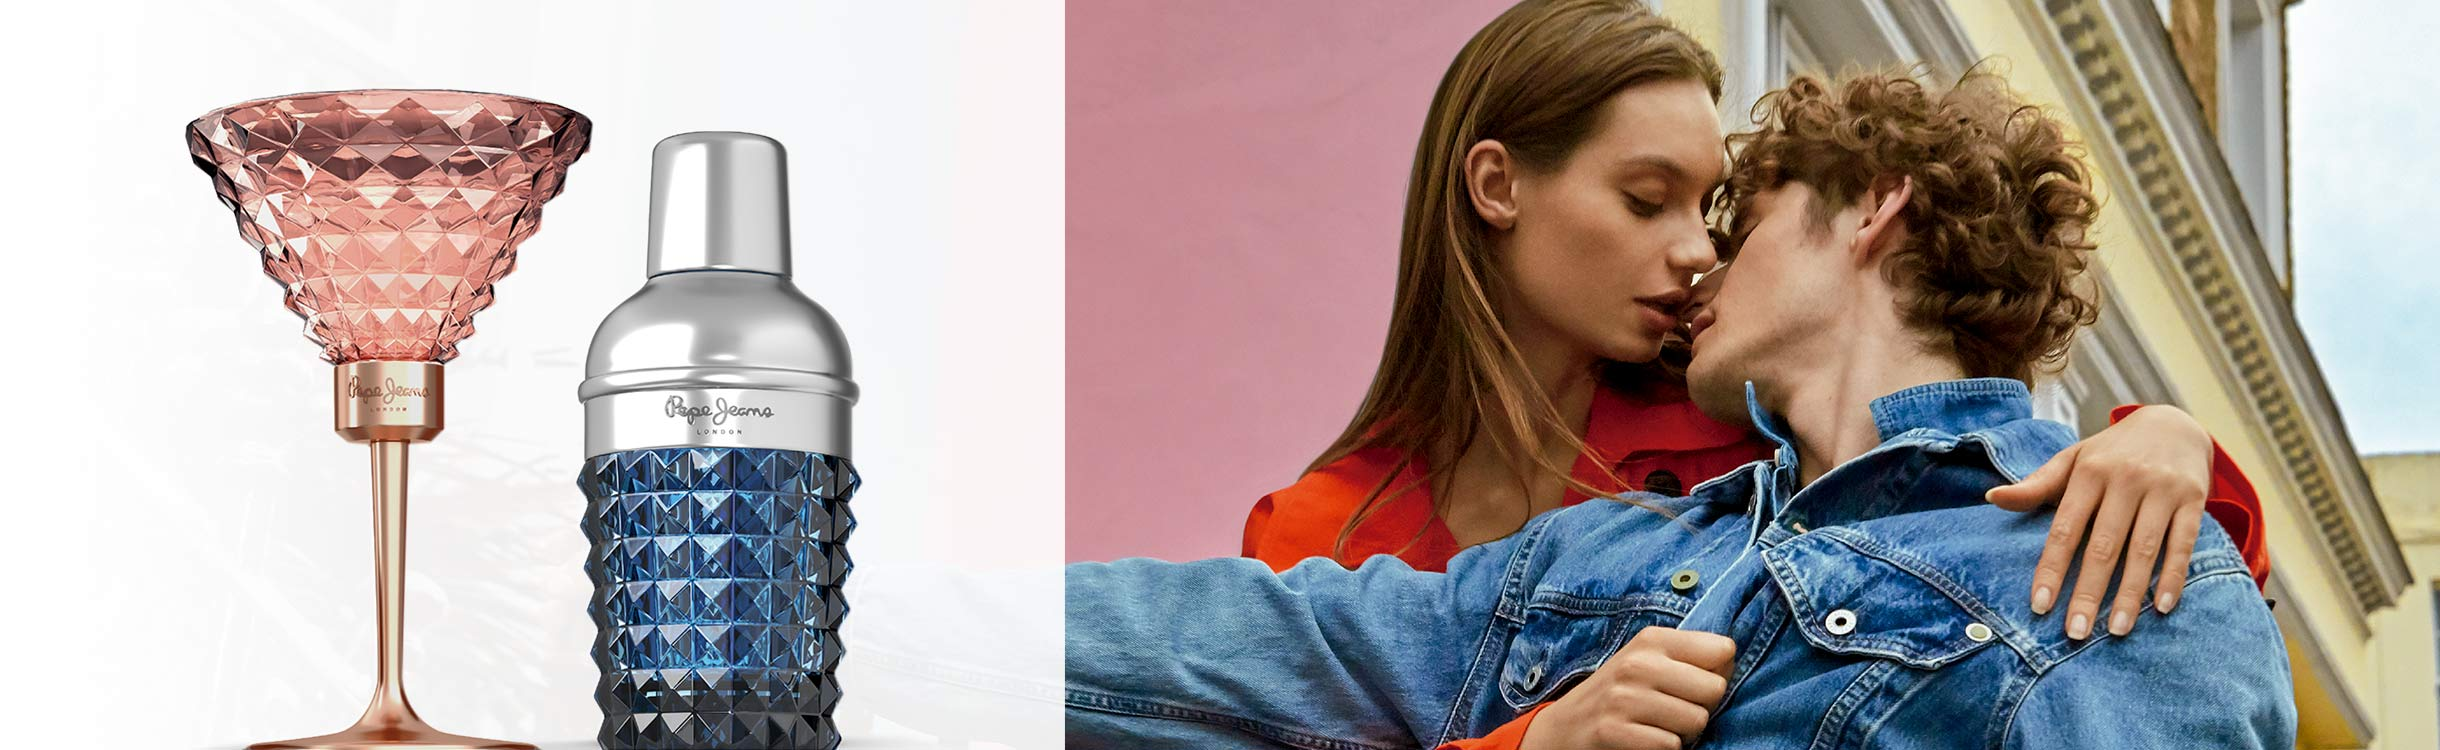 Lançamento Pepe Jeans